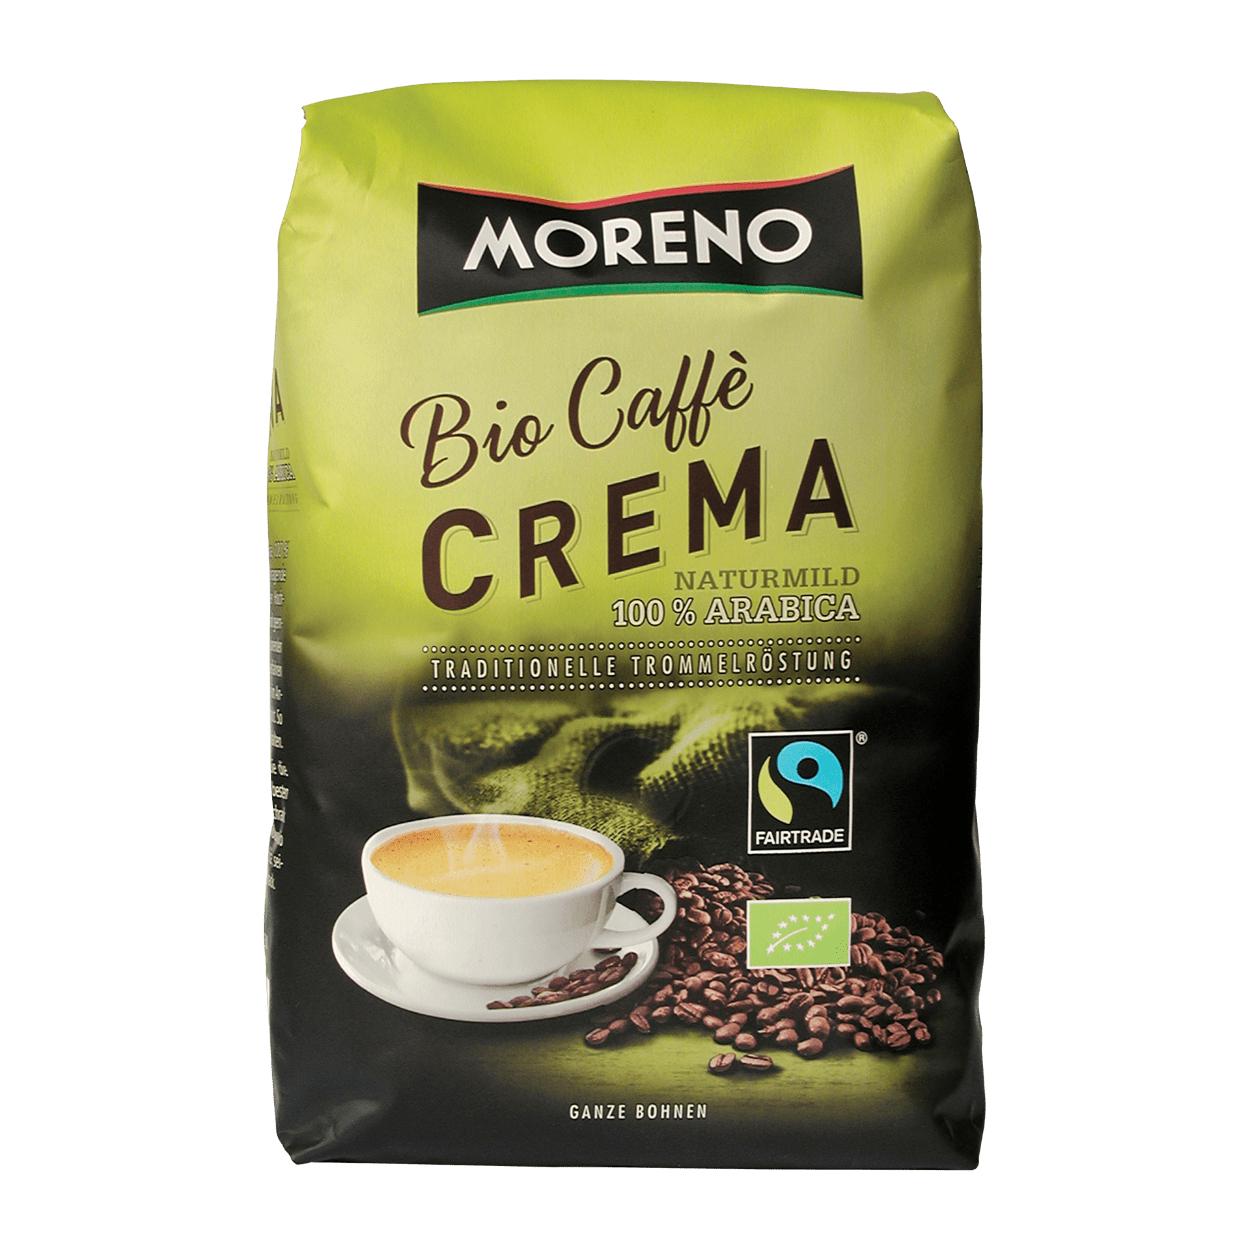 [Aldi Nord] Bio Fairtrade Kaffee, Trommelröstung, 100% Arabica